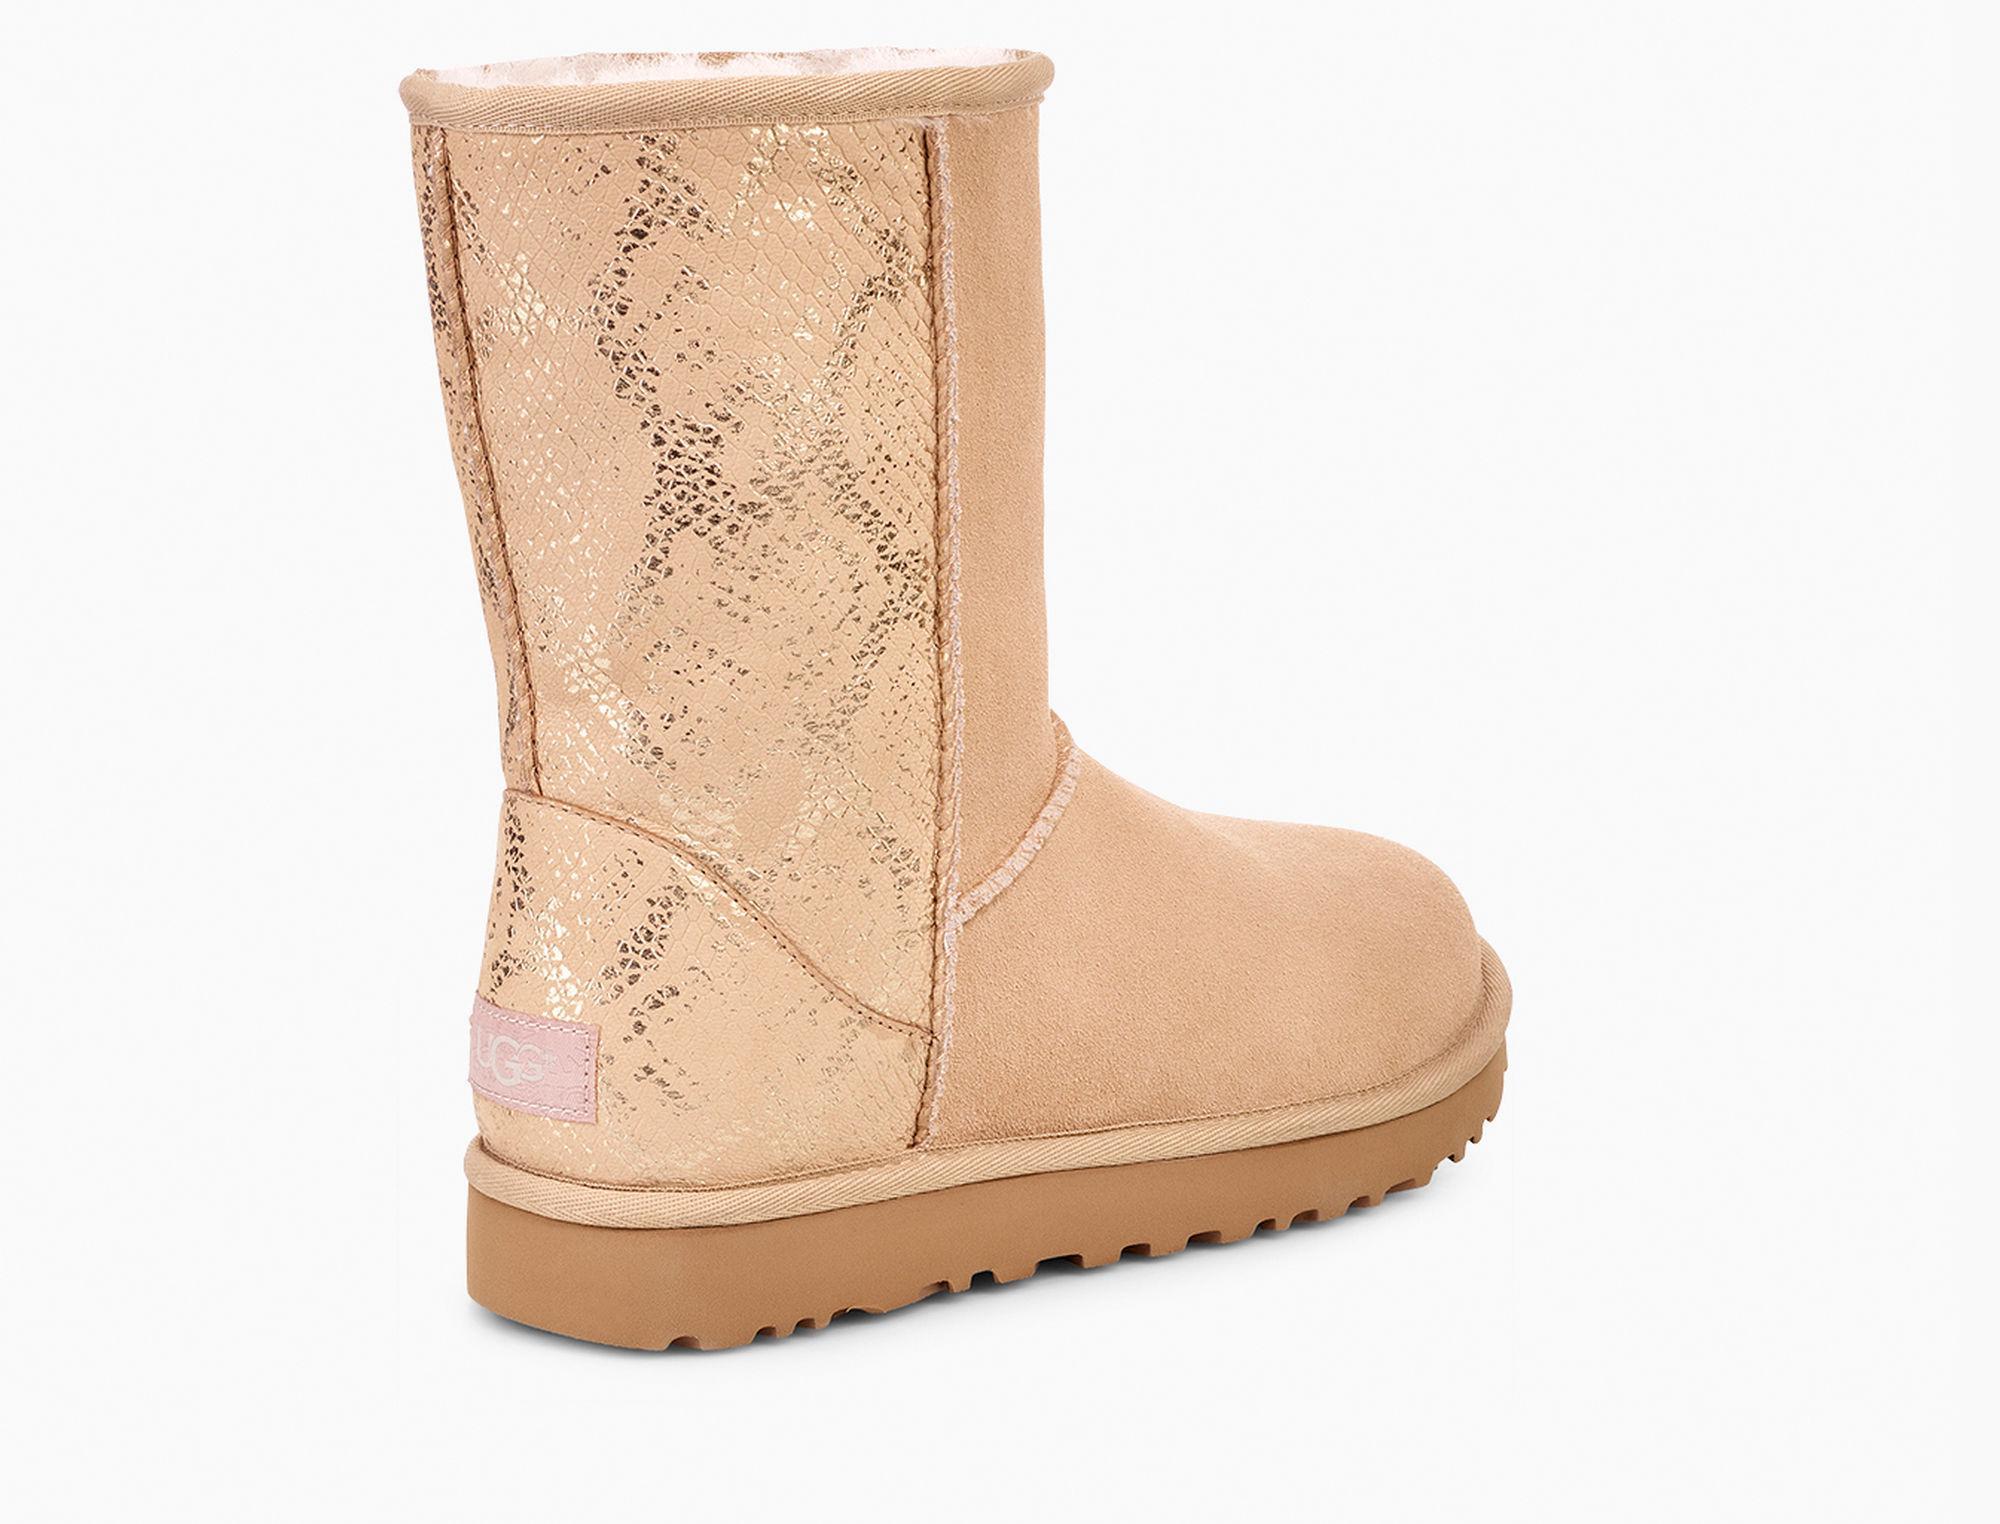 87843f1f890 Women's Classic Short Metallic Snake Boot Classic Short Metallic Snake Boot